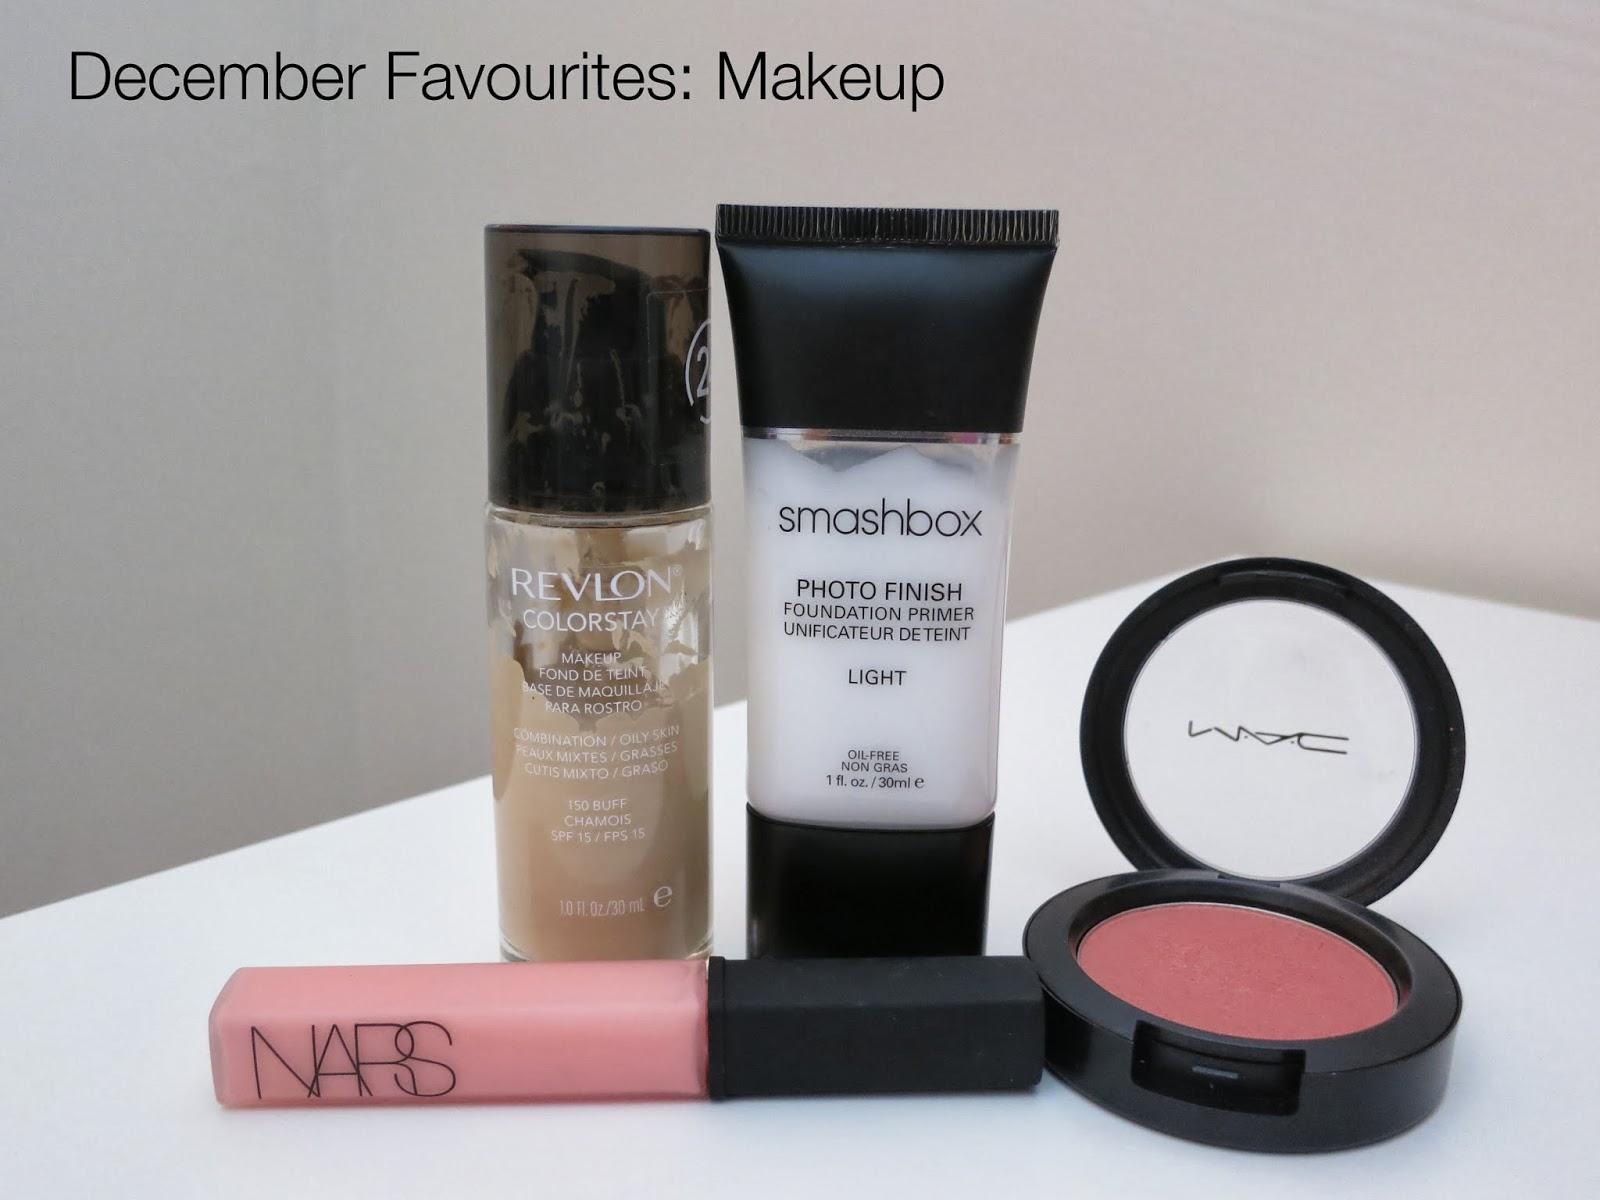 december beauty favourites, yearly beauty favourites, 2013 beauty favourites, revlon colorstay, mac blush, smashbox primer, nars lipgloss